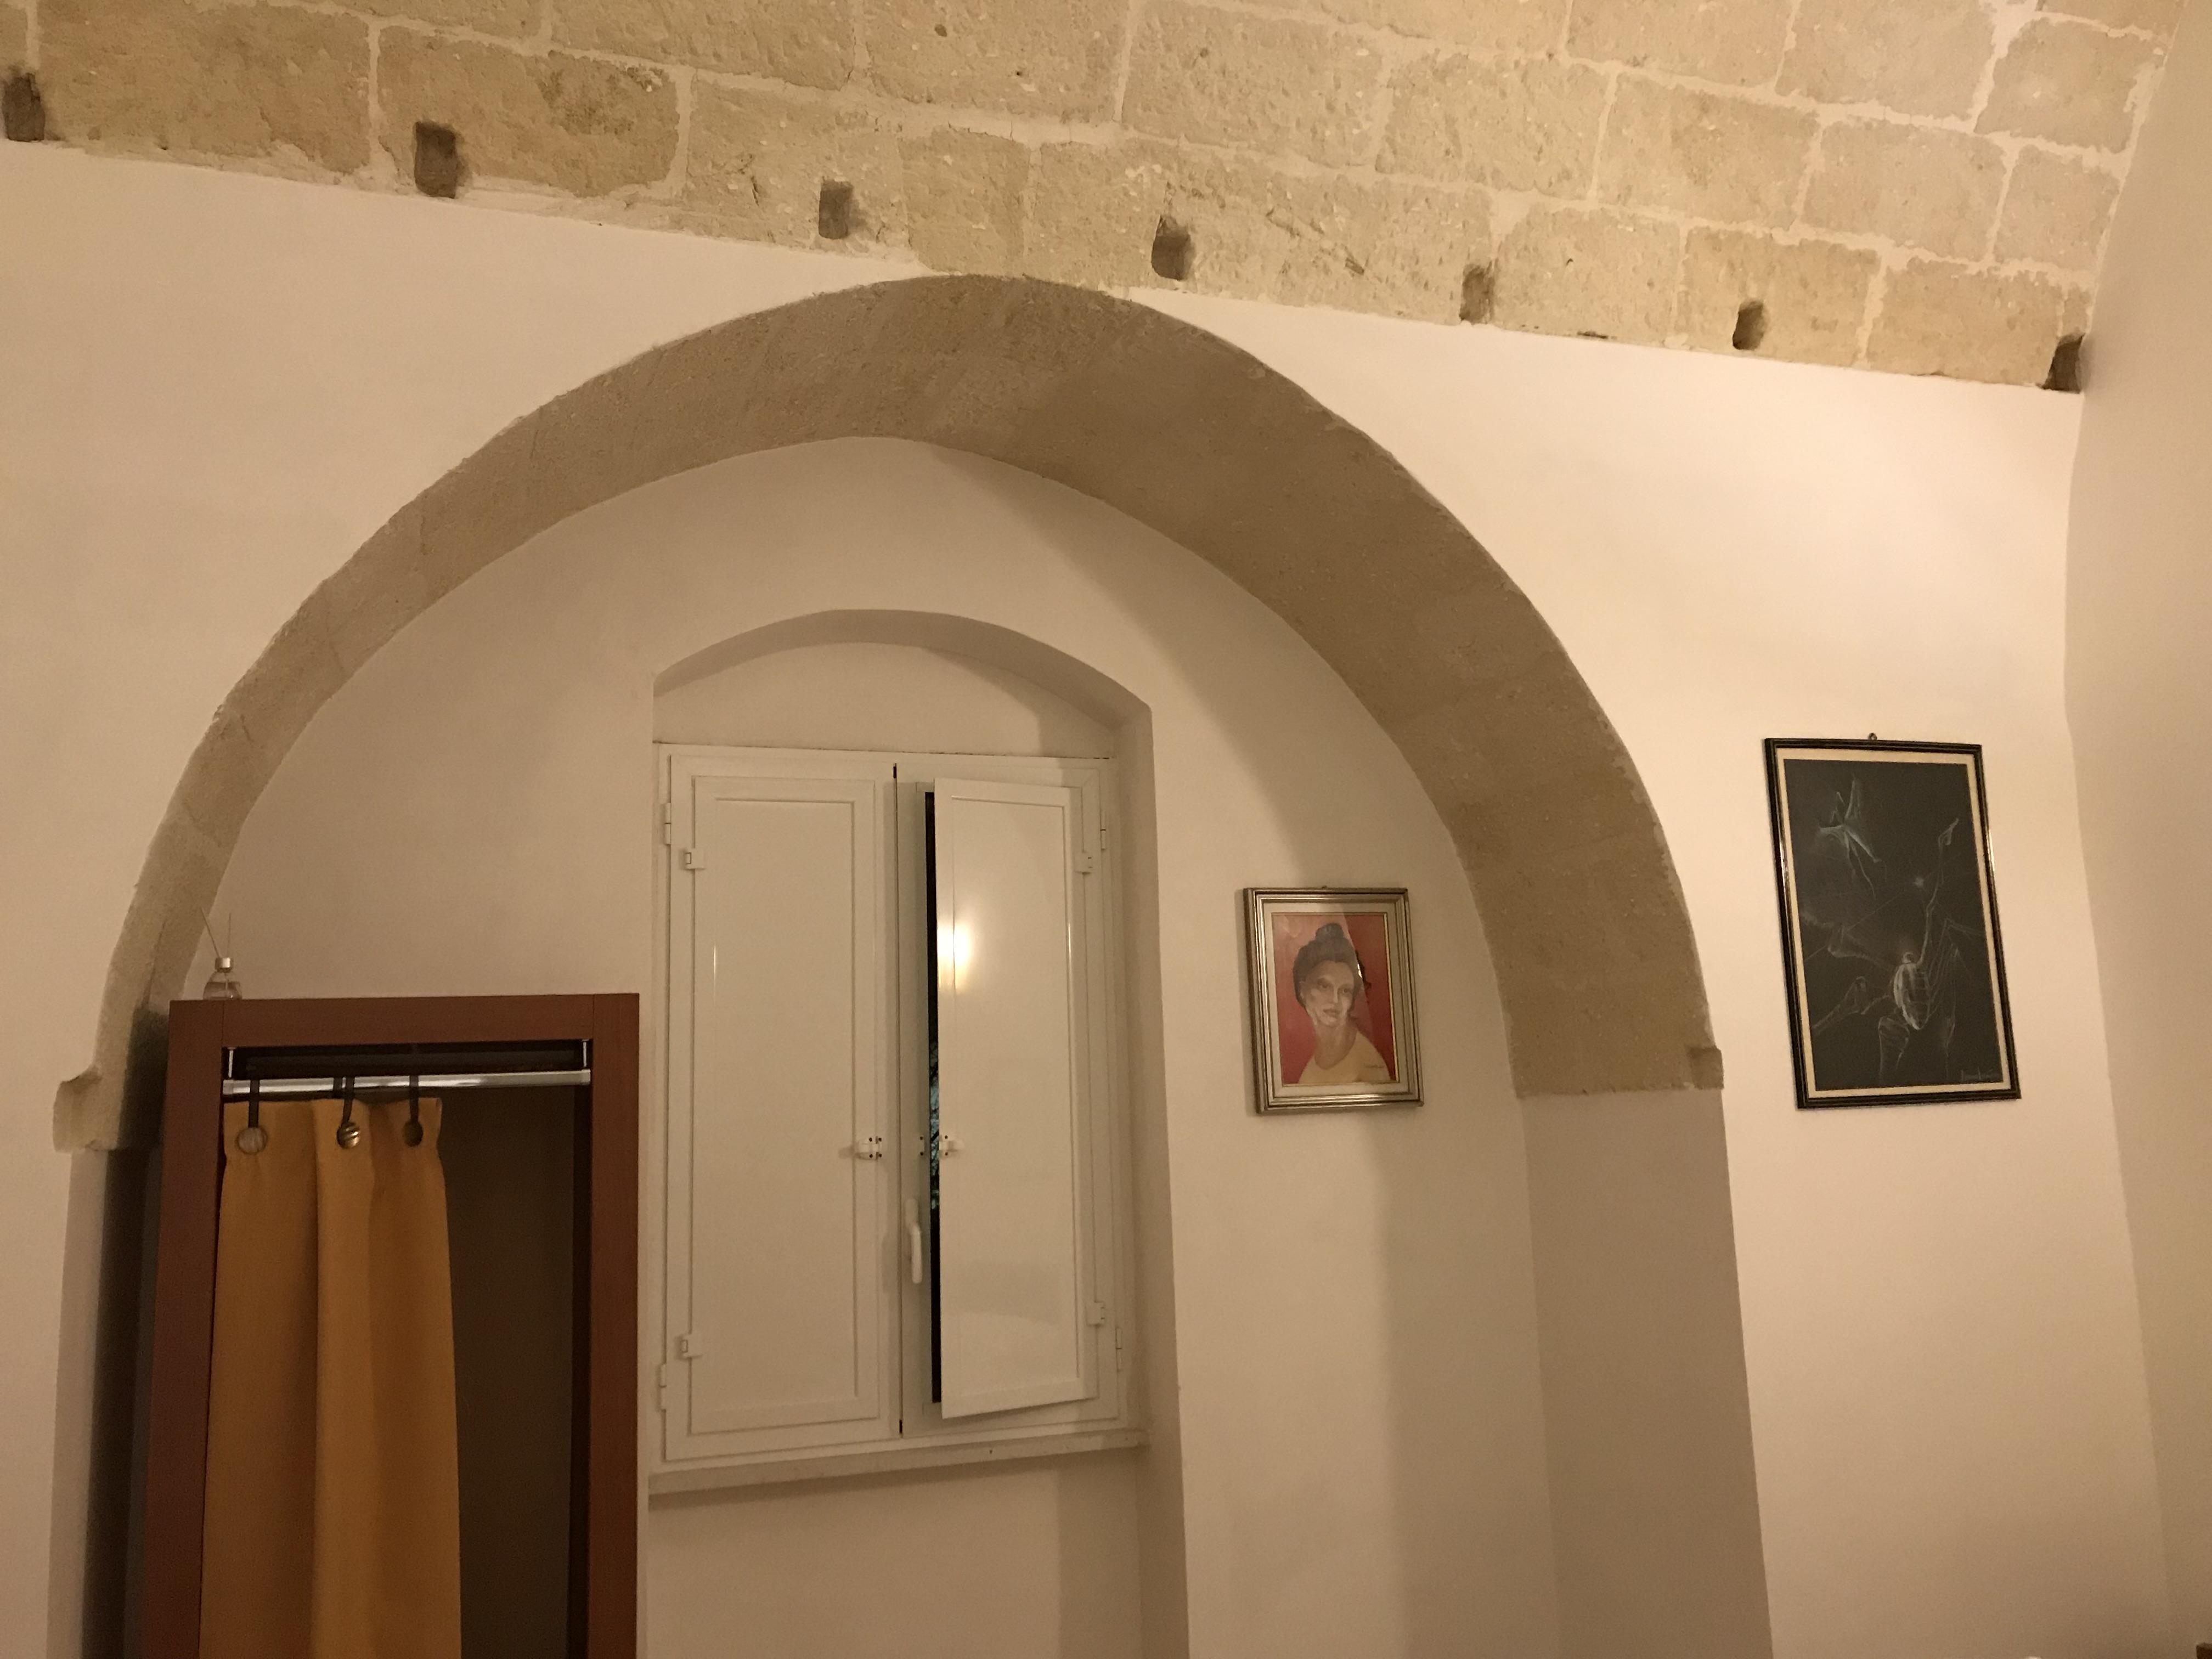 Ferienwohnung Parva Domus in Matera (2598921), Matera, Matera, Basilikata, Italien, Bild 6